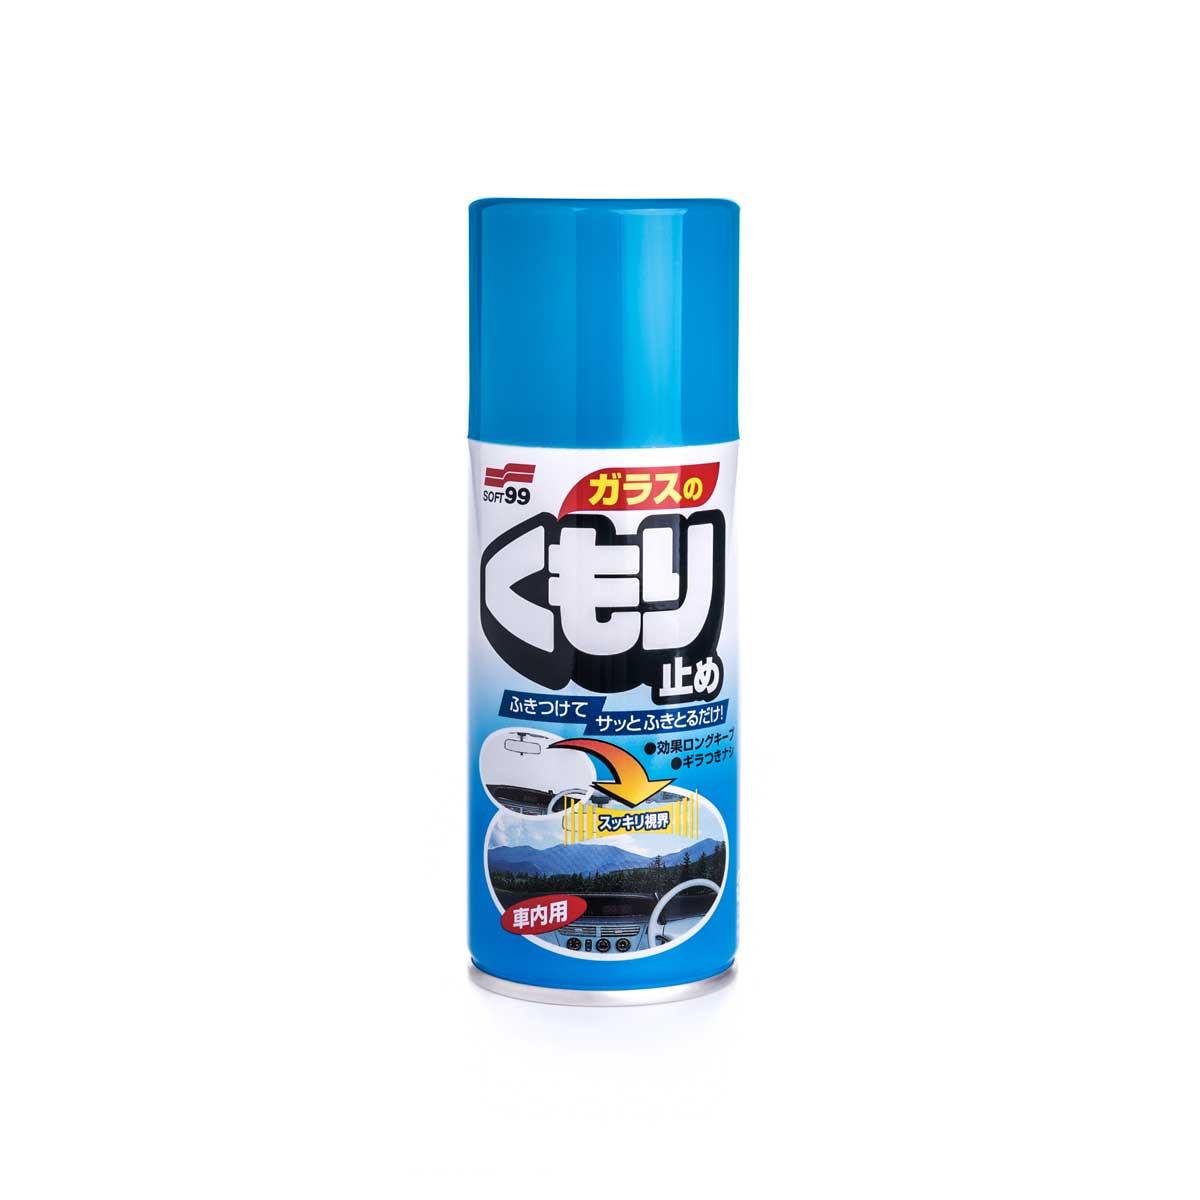 Imskyddsmedel Soft99 Anti-Fog Spray, 180 ml